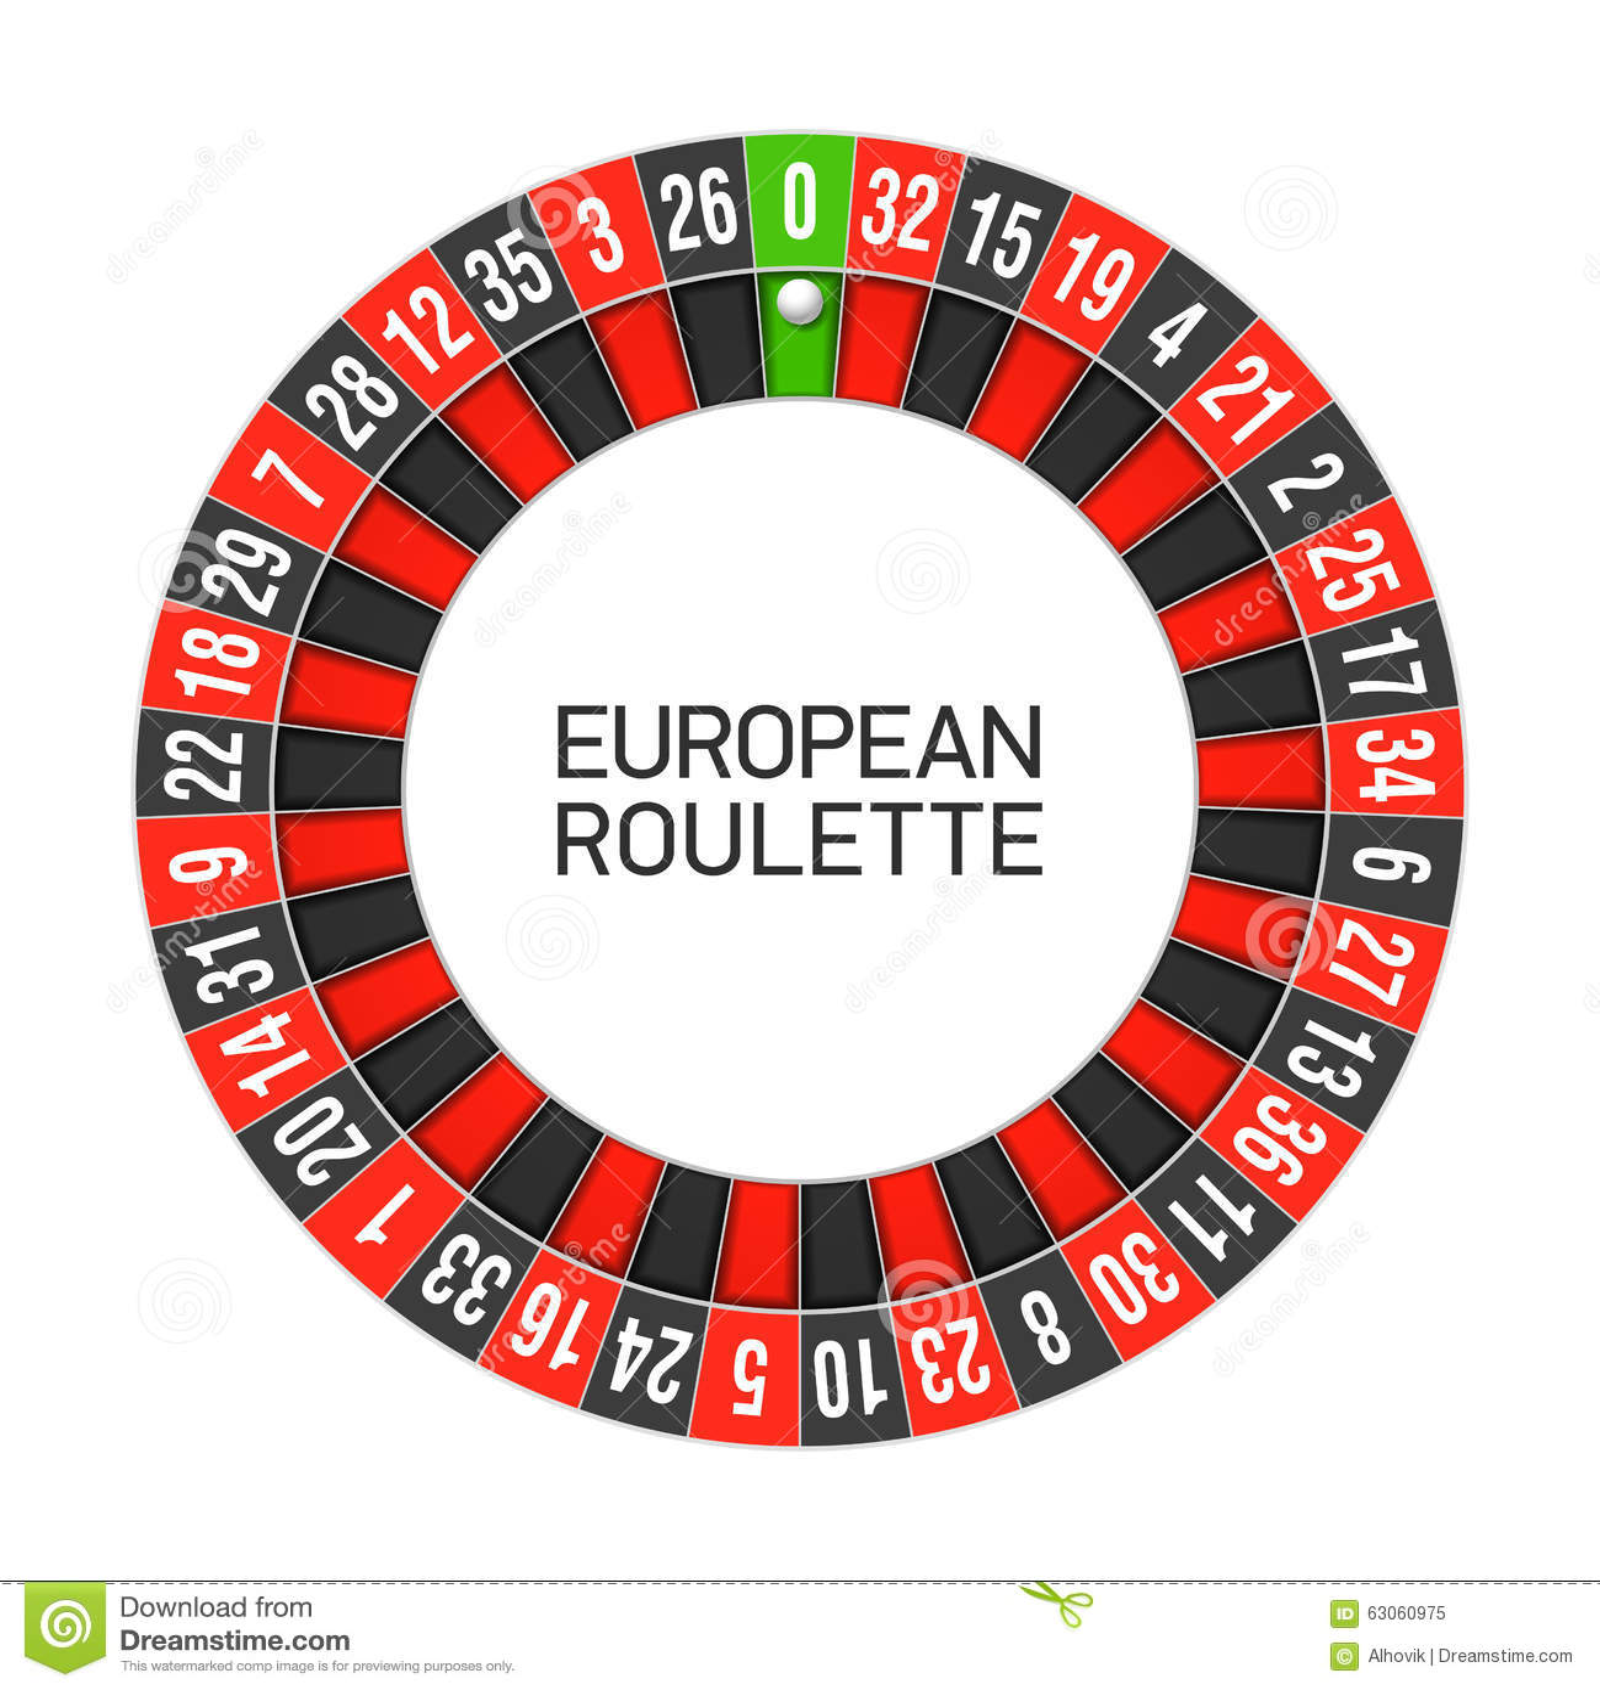 Disposizione numeri ruota roulette